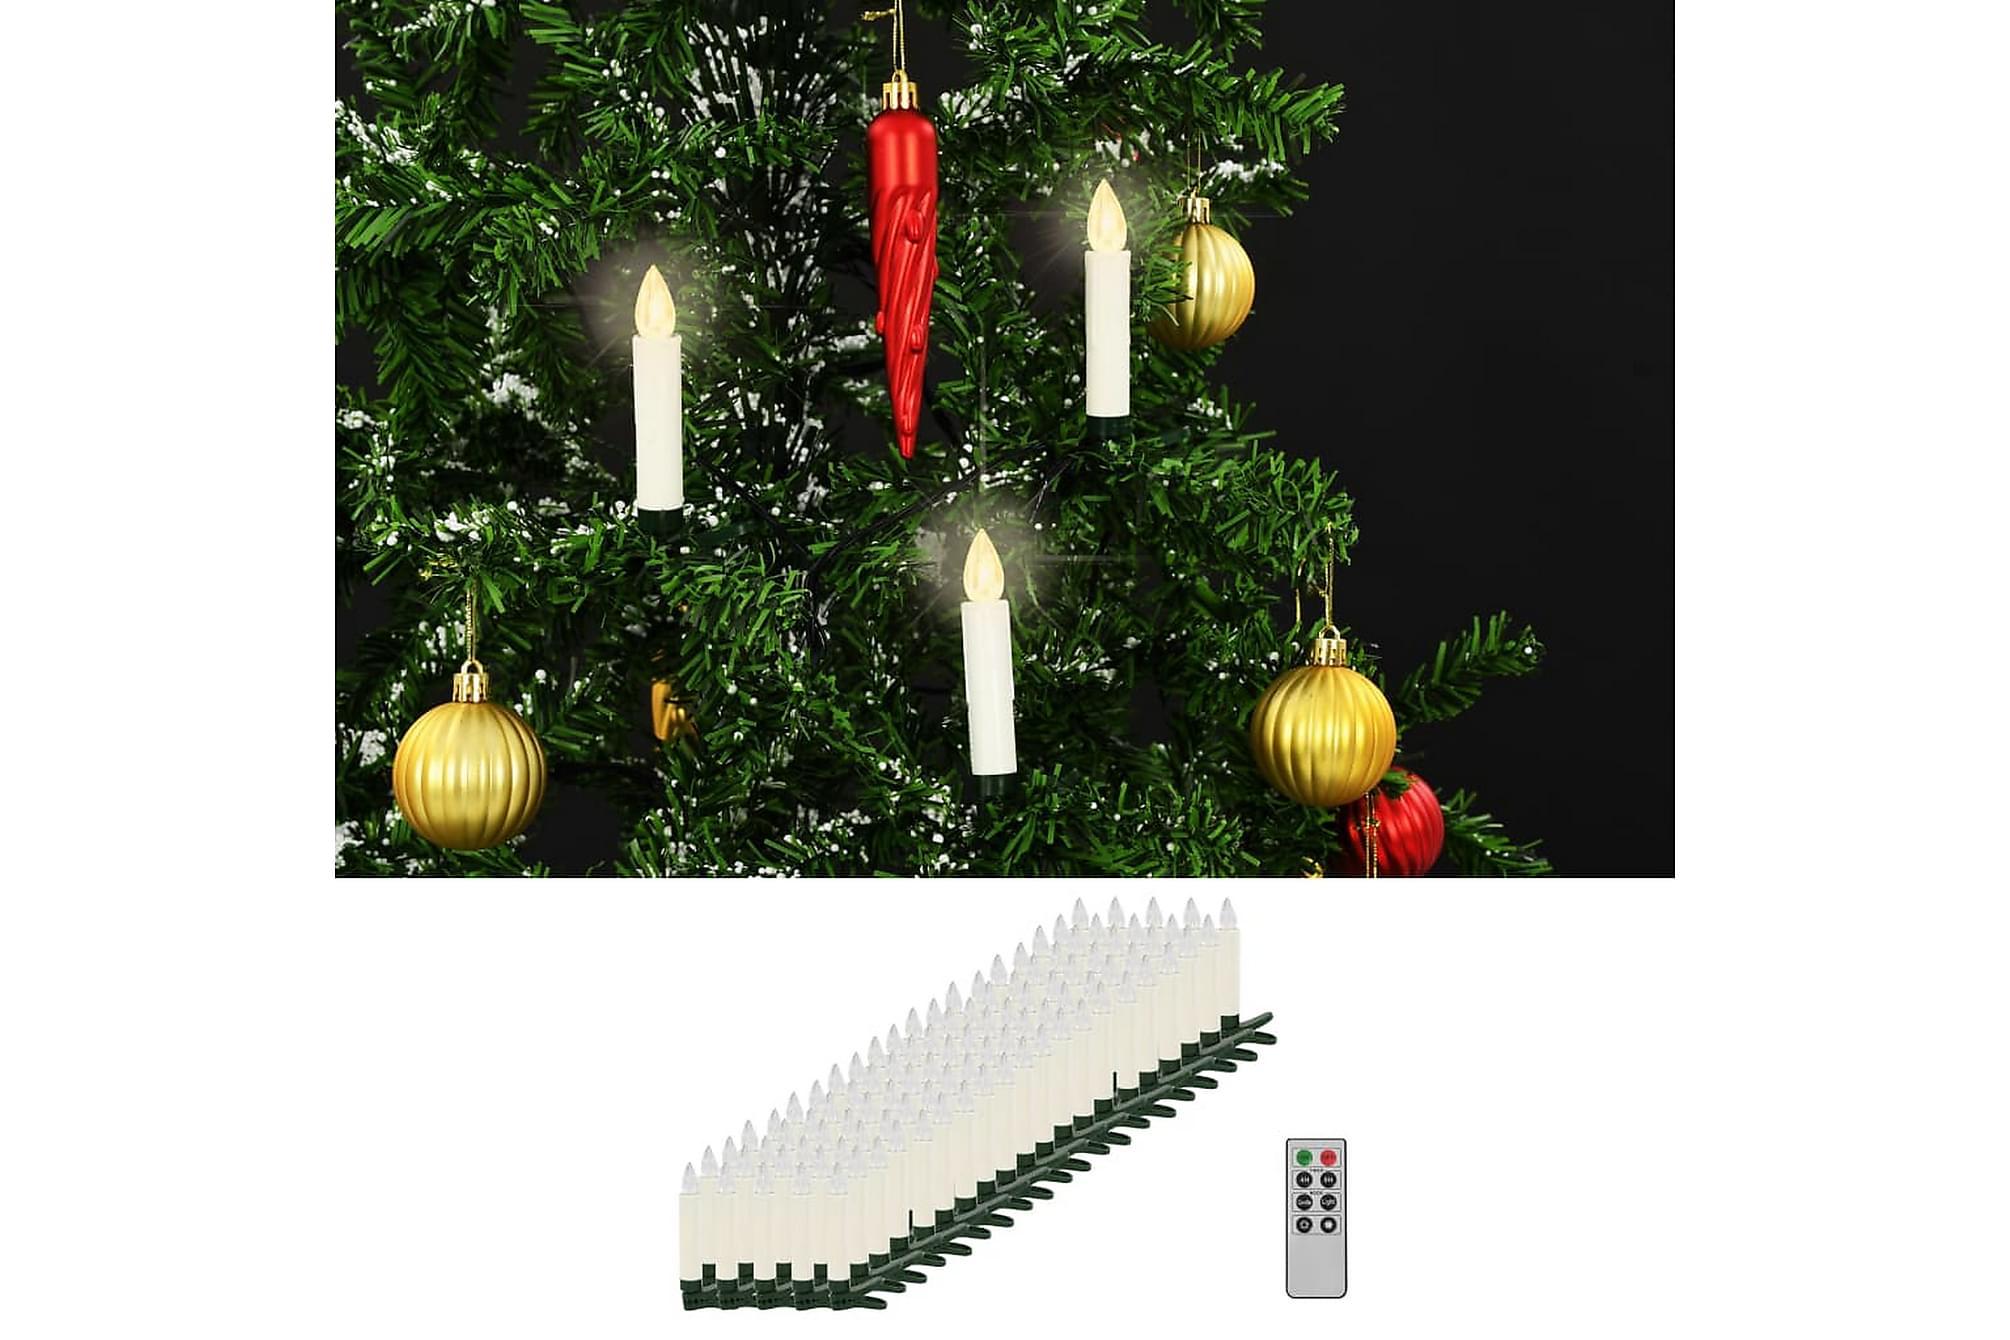 Trådlösa LED-ljus med fjärrkontroll 100 st varmvit